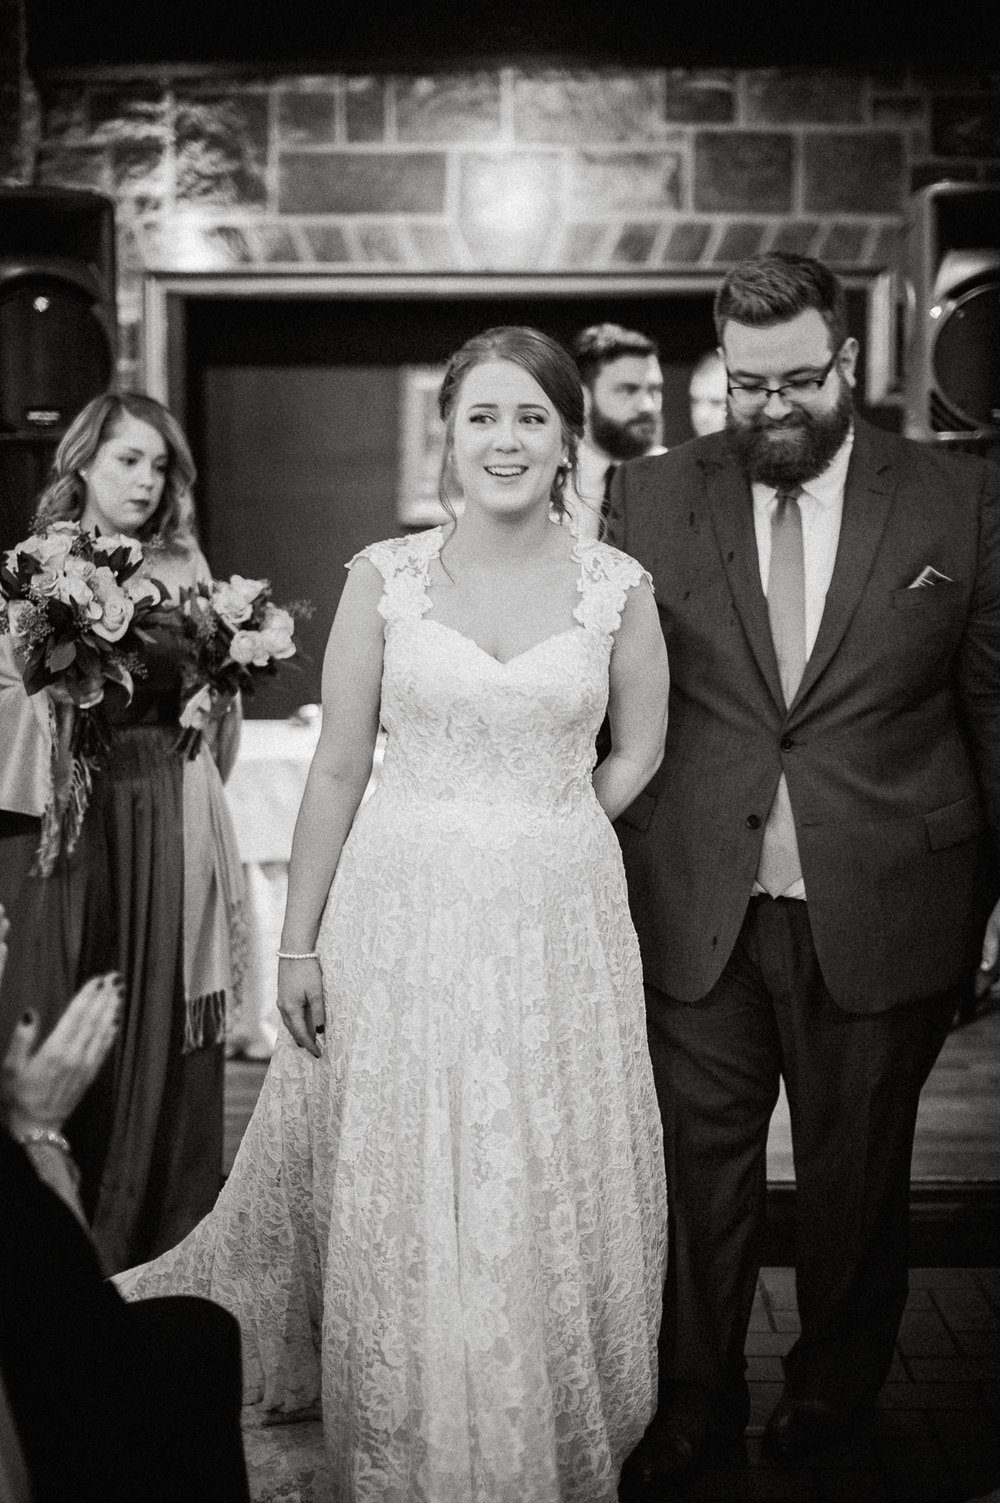 breighton-and-basette-photography-copyrighted-image-blog-amanda-and-eric-wedding-087.jpg